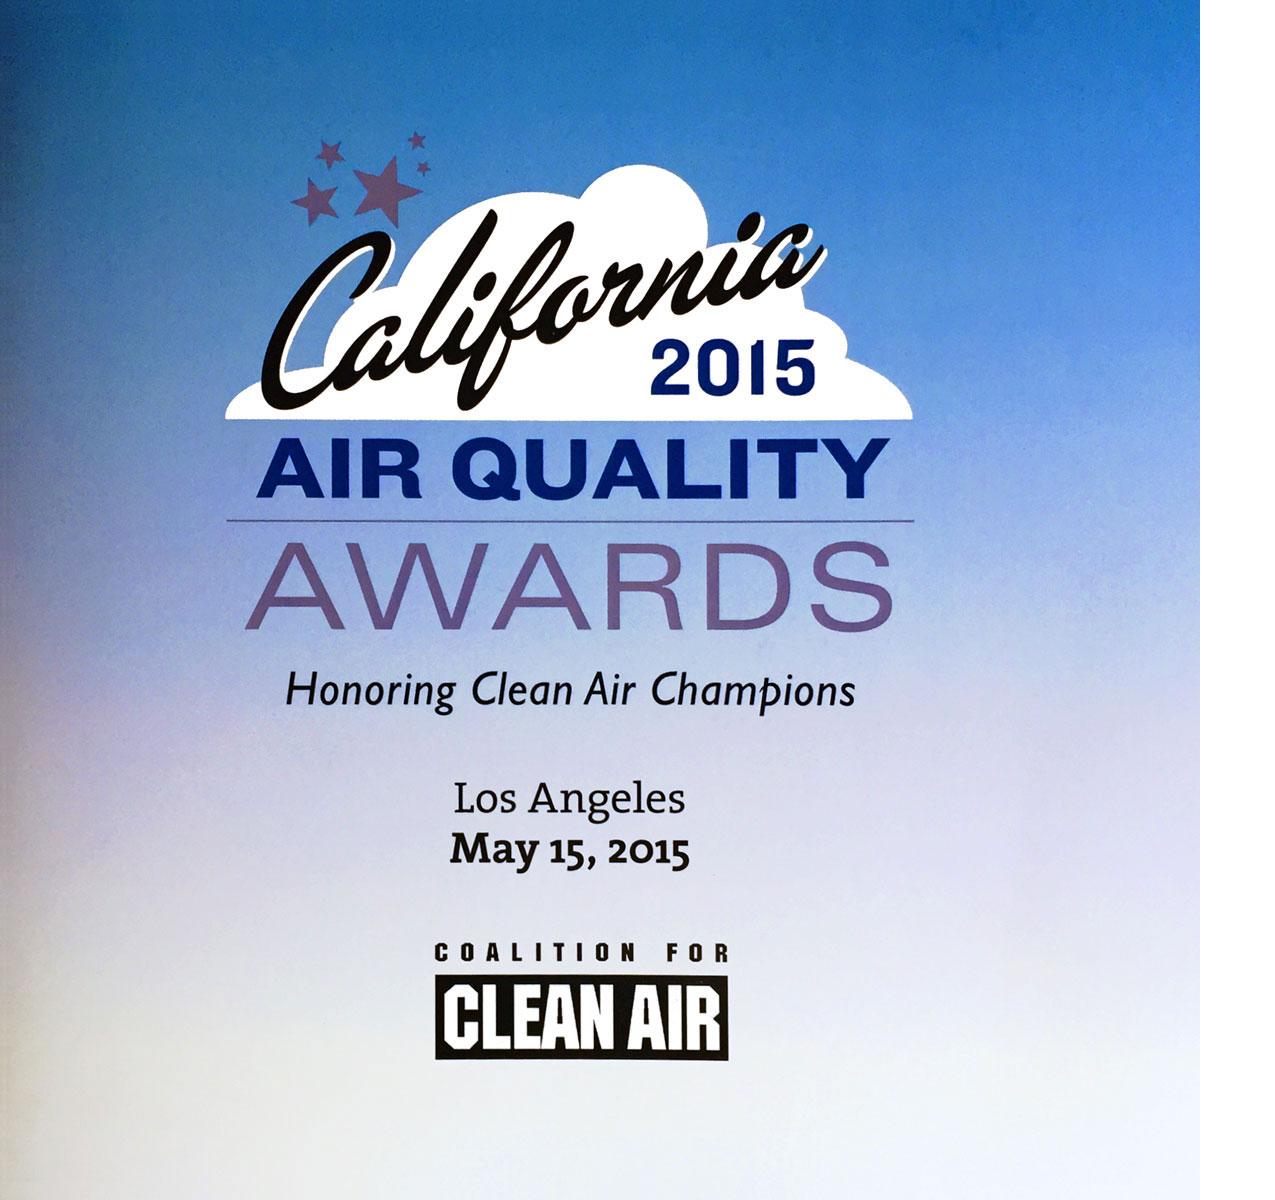 AGZA_EVENT_CCA_Awards_2015_03_program_square_1200+pad.jpg